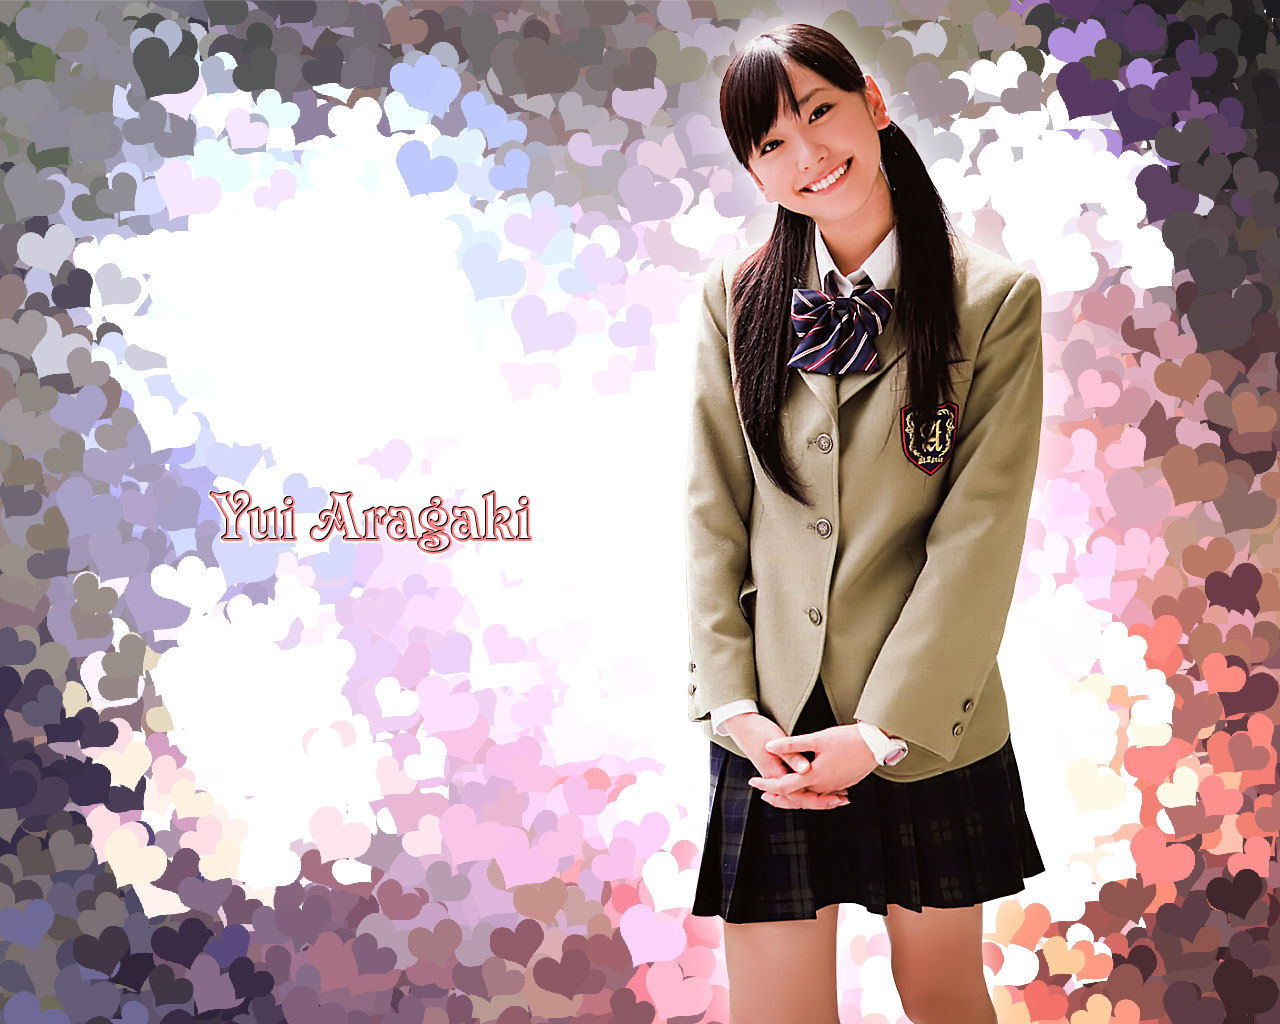 aragaki_yui068.jpg